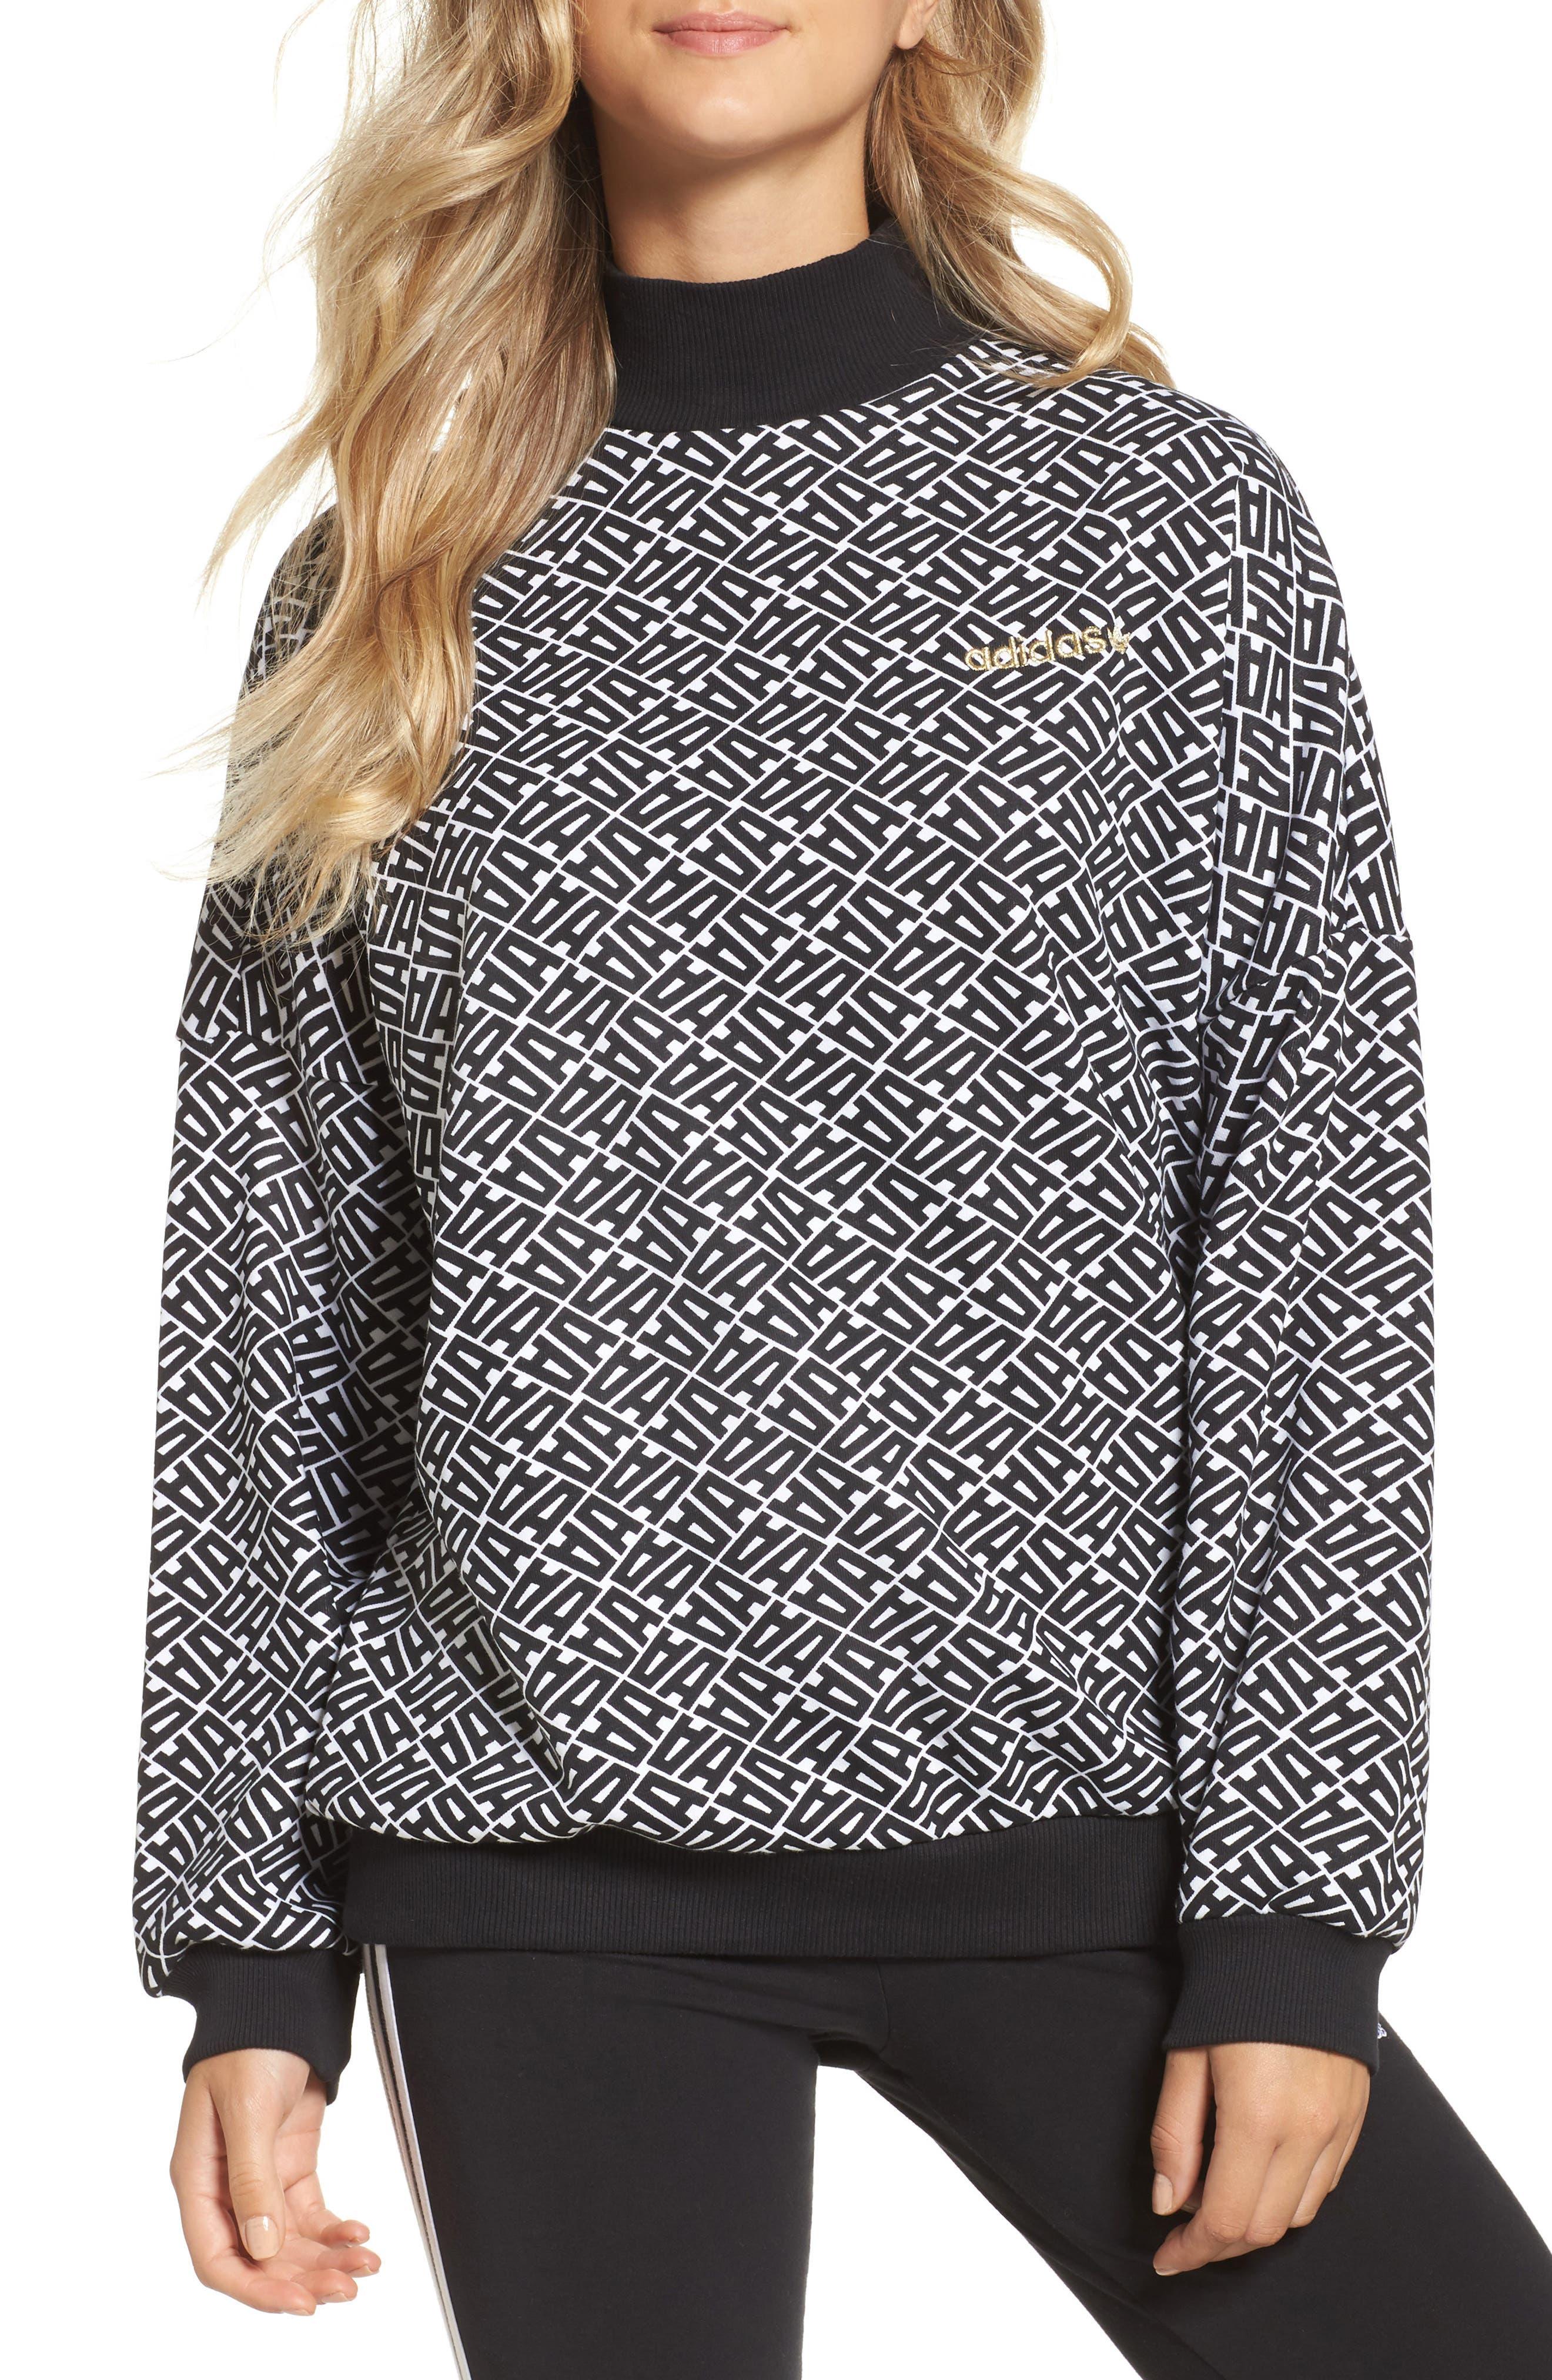 AOP Print Sweatshirt,                         Main,                         color, 001